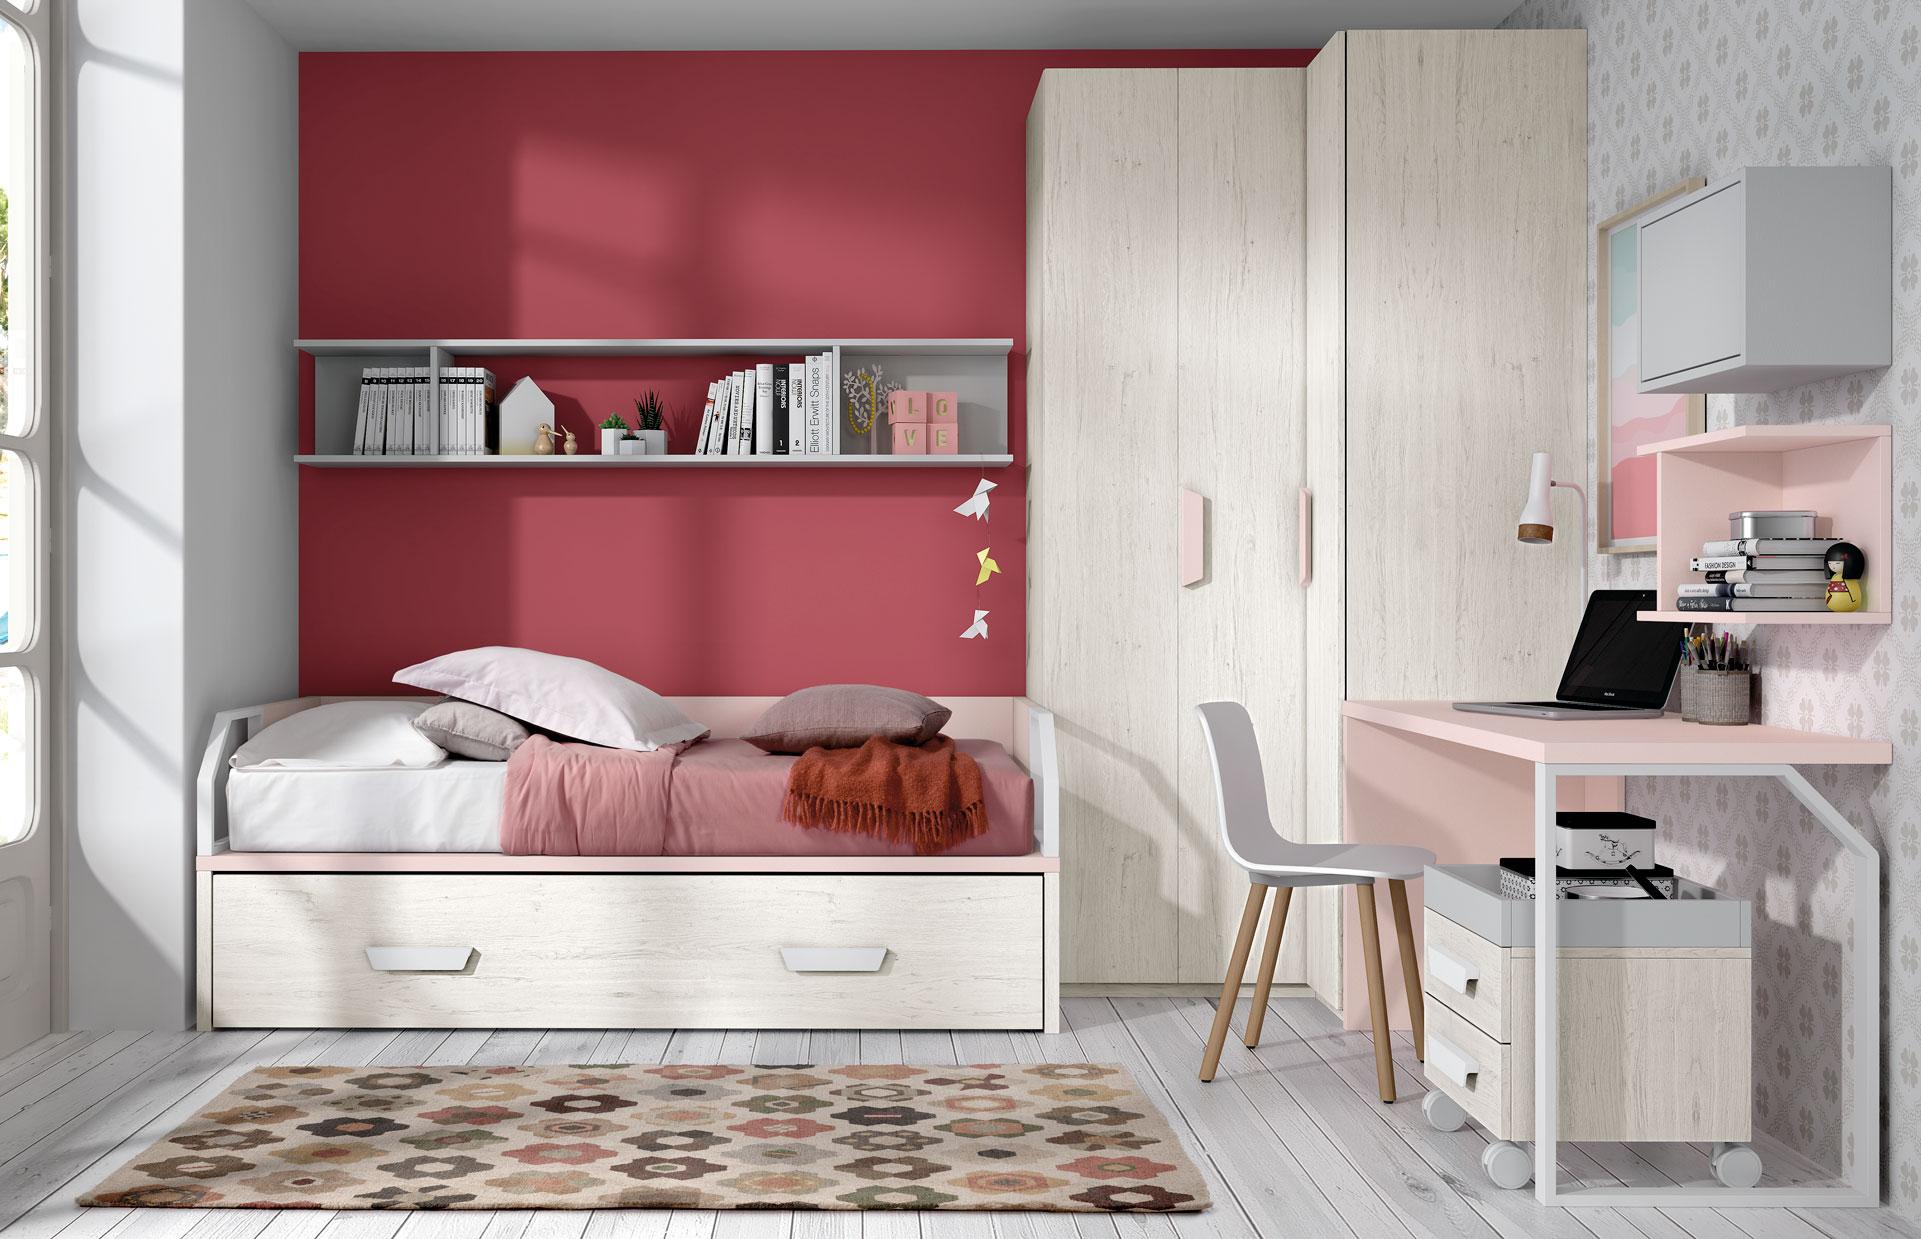 Dormitorio Juvenil Ros Nido Urban Rosa Gris